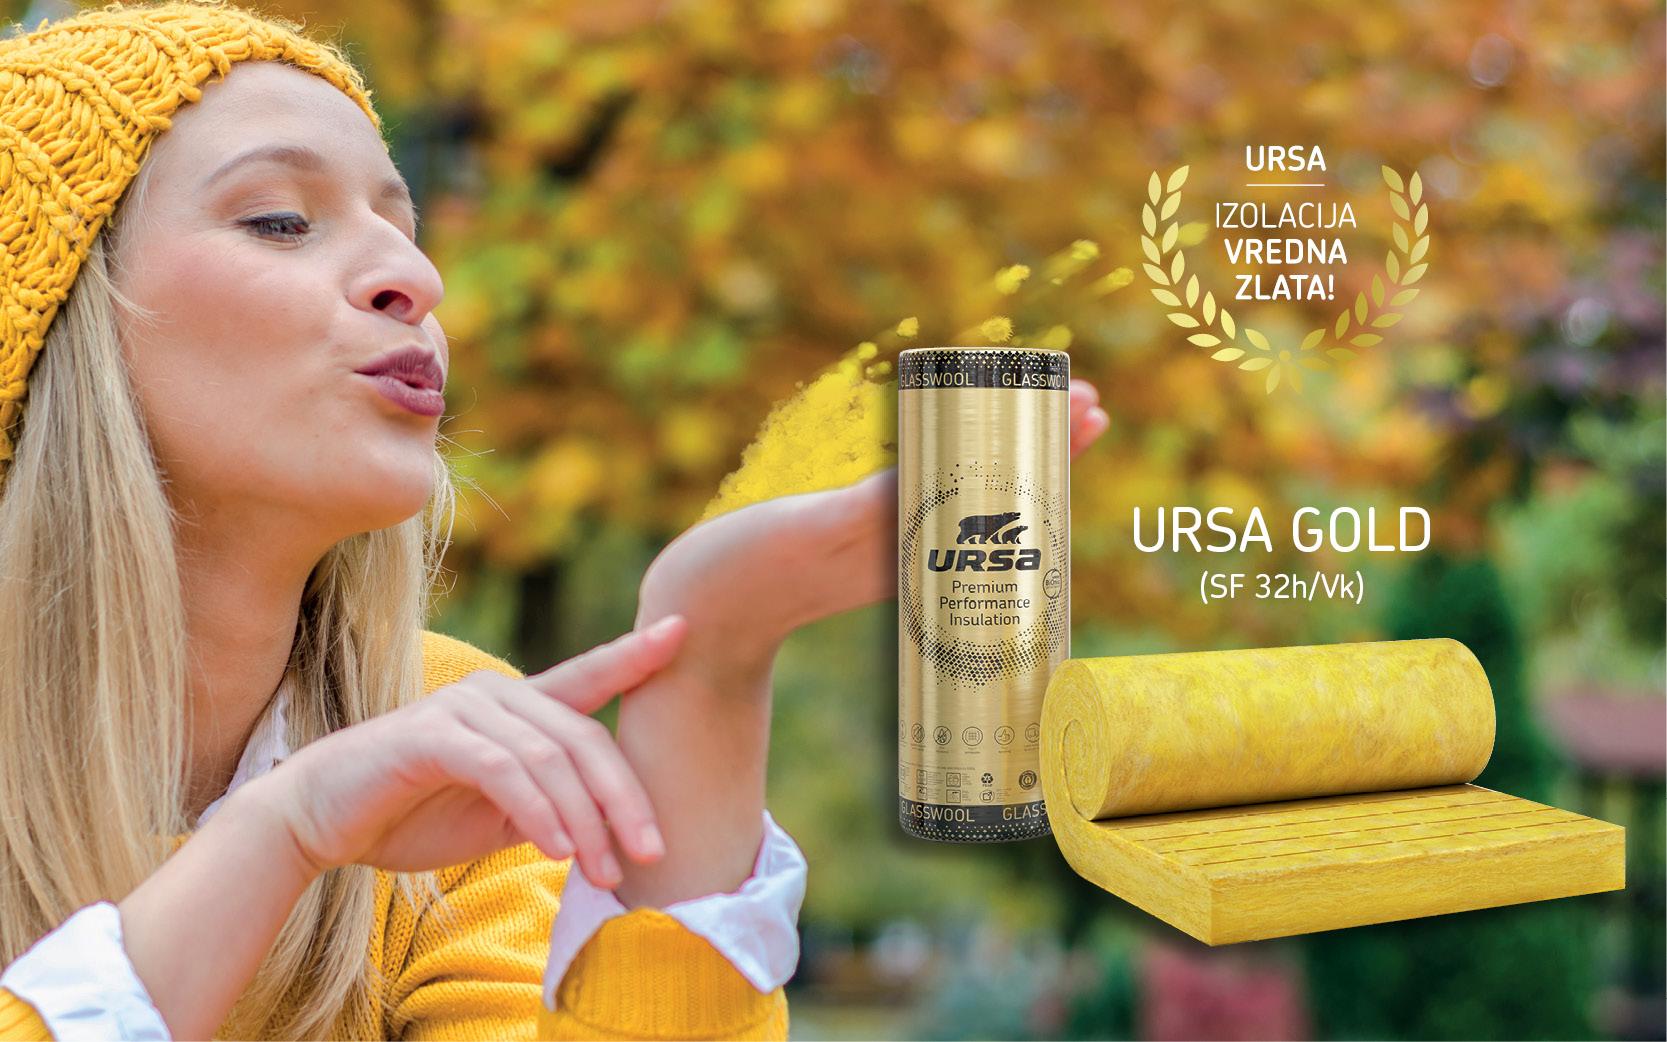 ursa-1586250404.jpg